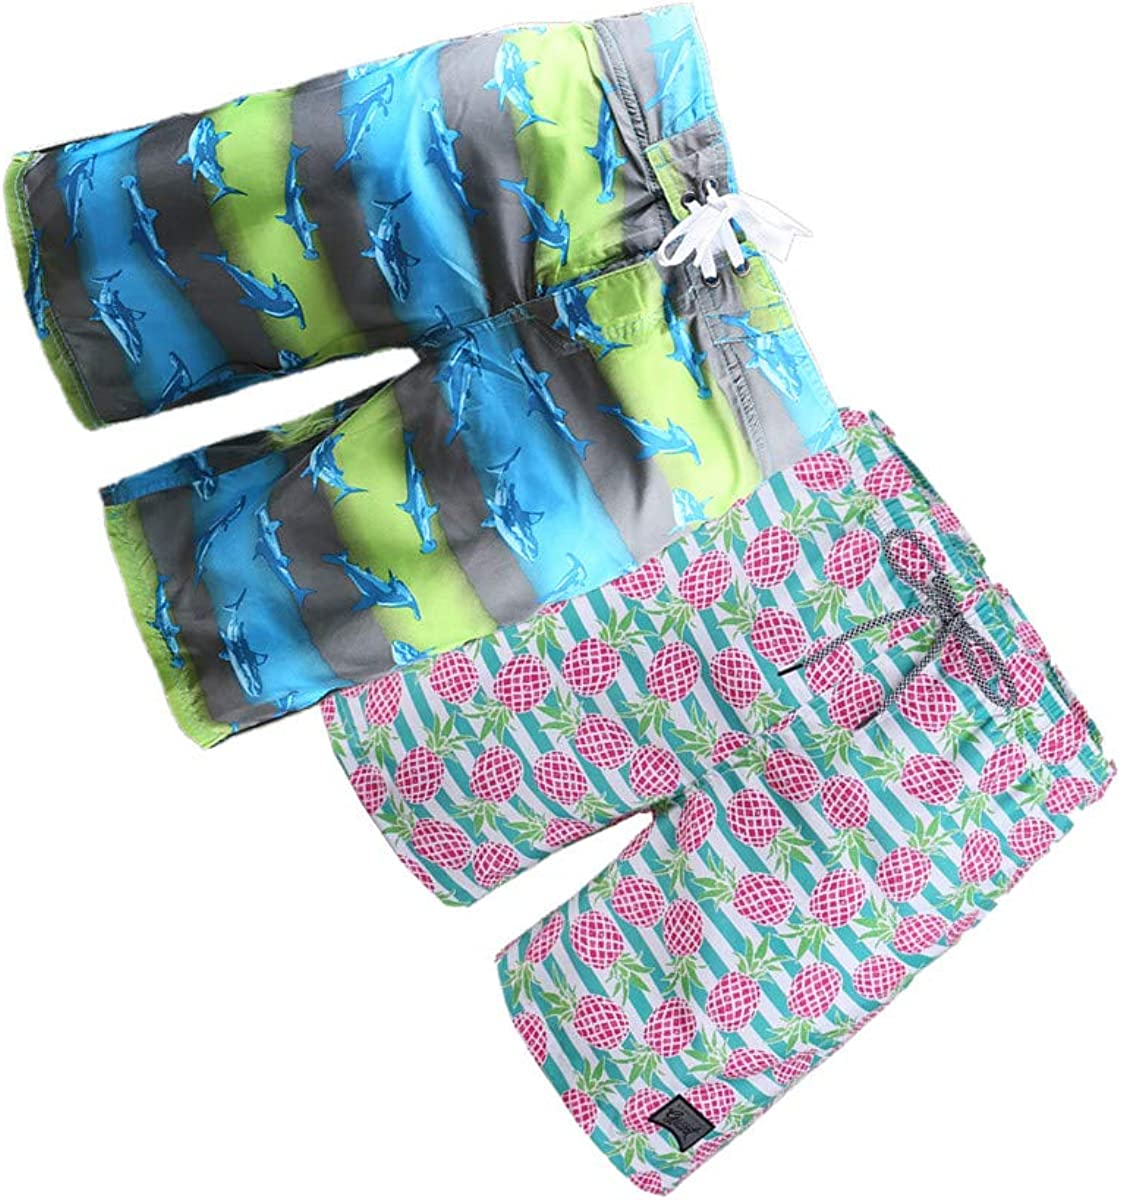 BG 2-Pcs Pack Men's Design Rash Guard Hawaiian Flamingo Sunny Pocket Board Shorts